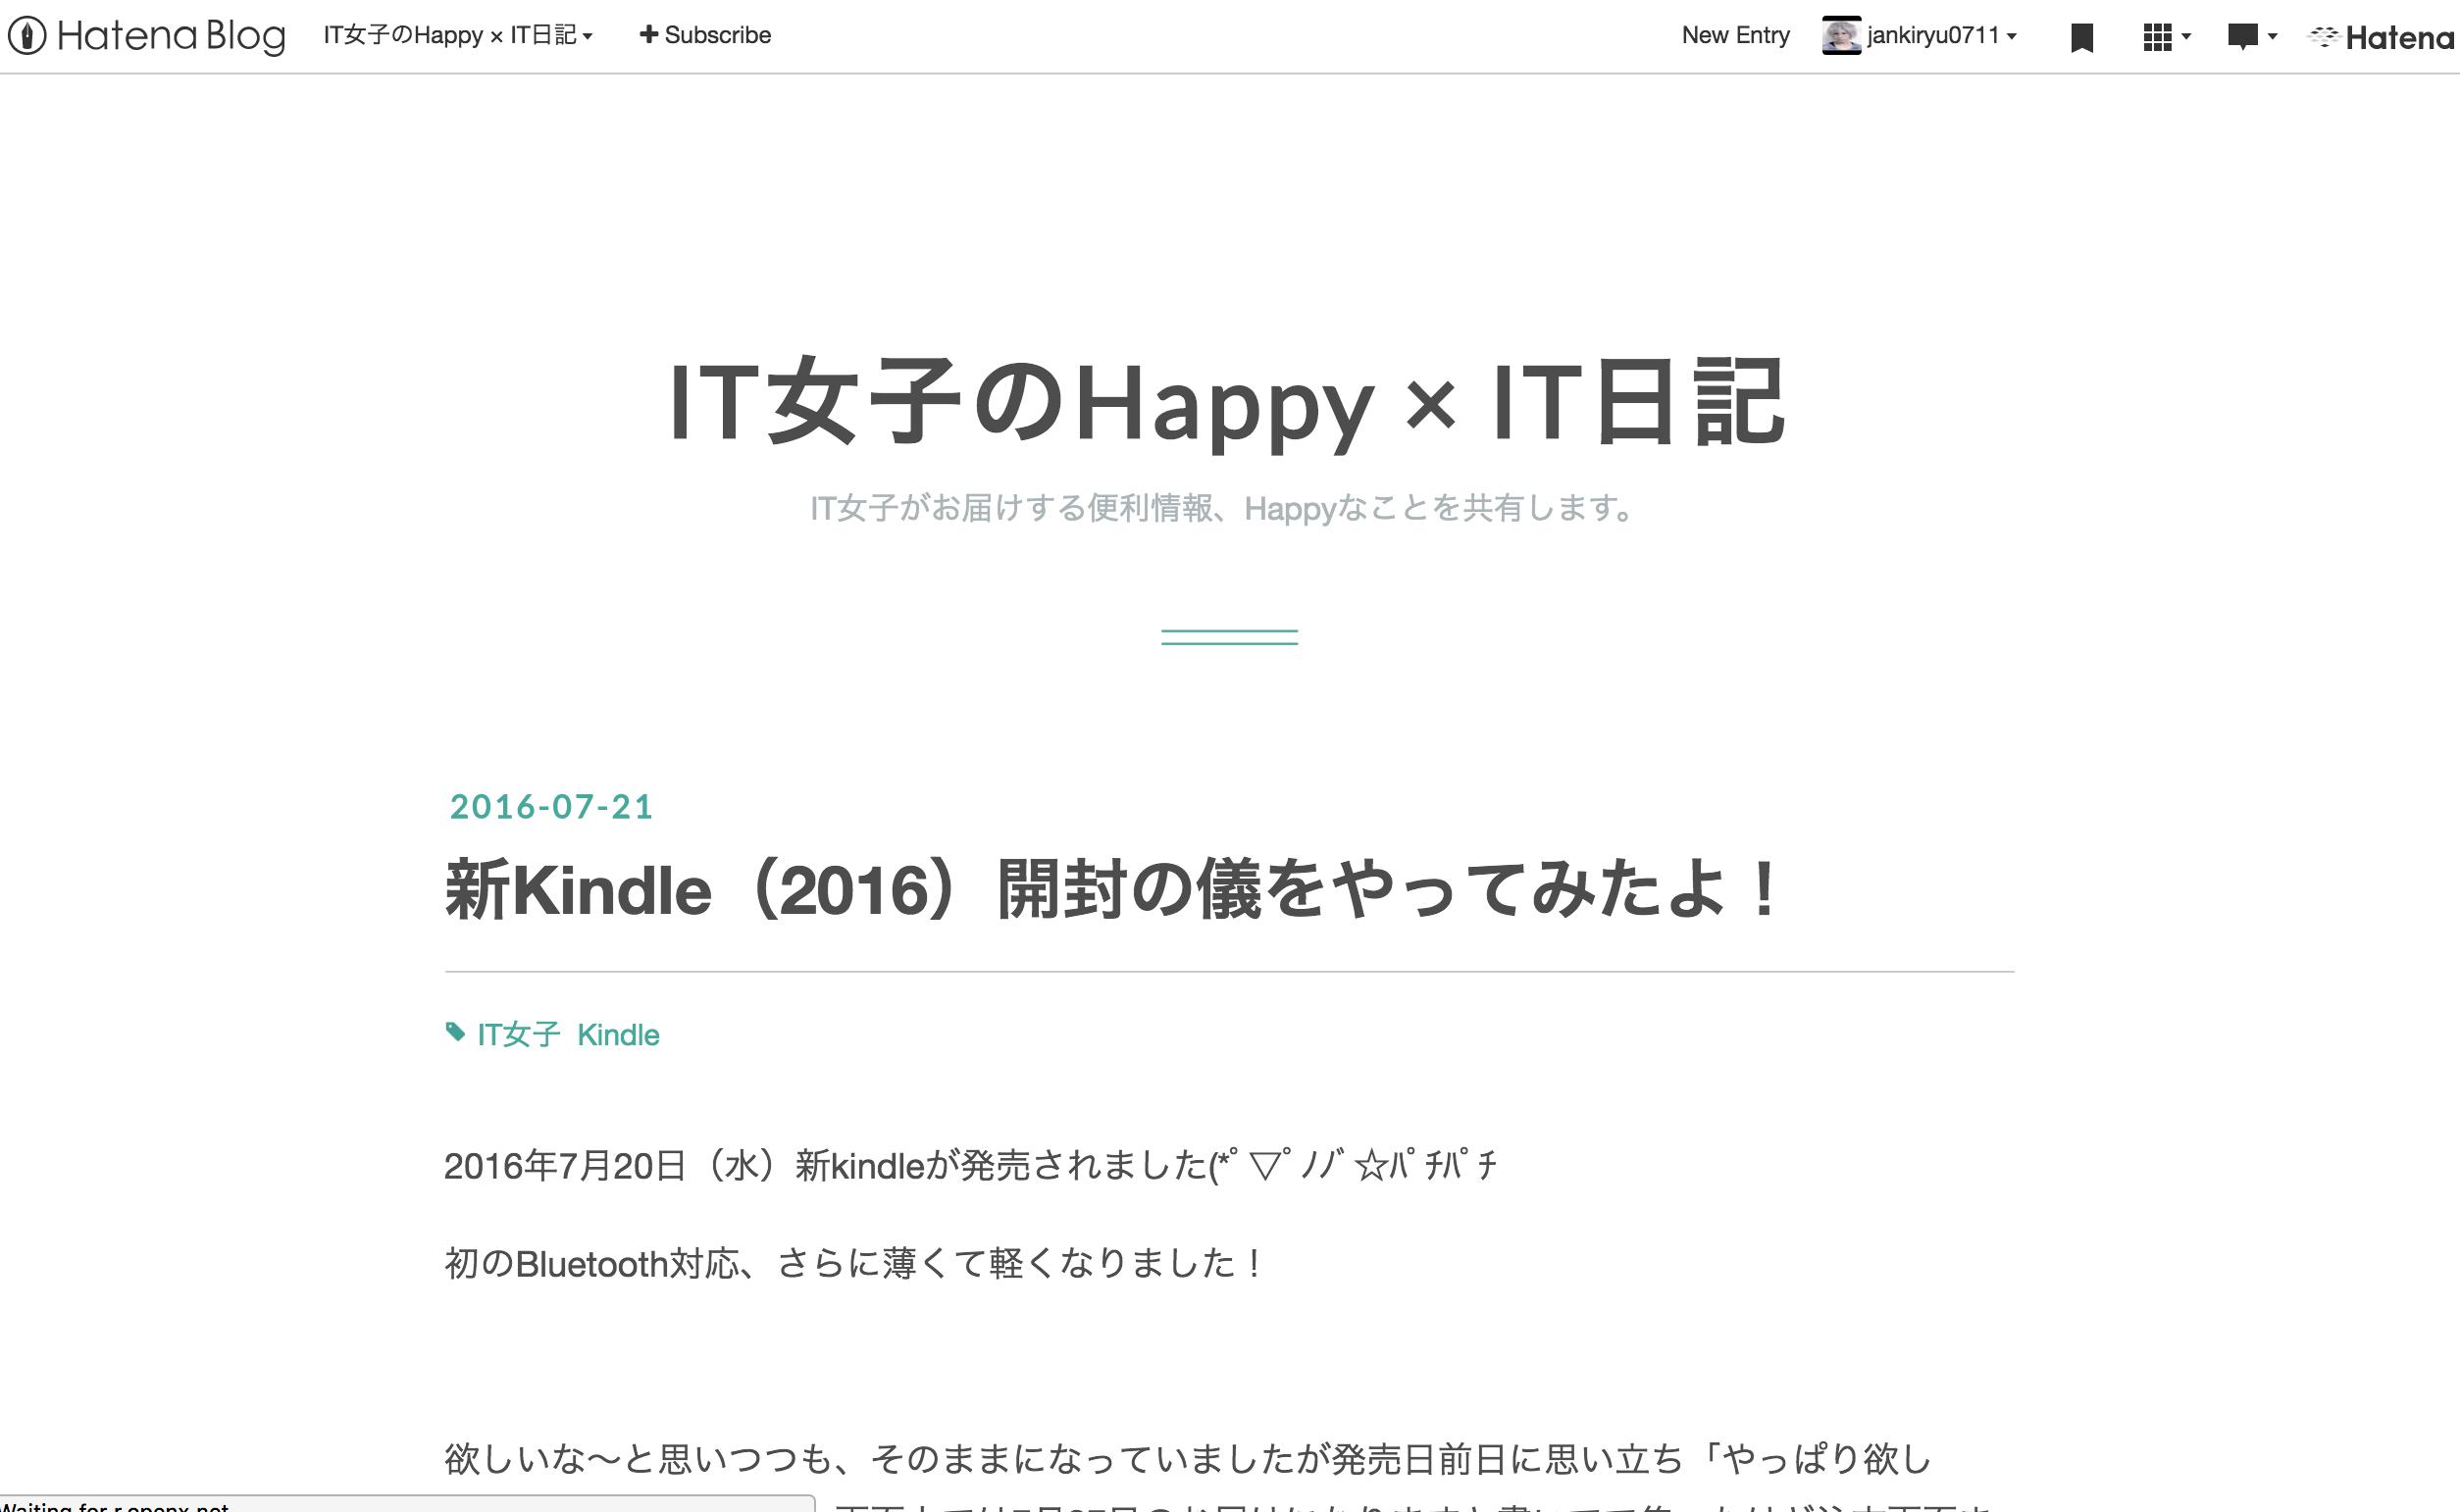 Screenshot 2016-08-10 03.40.00